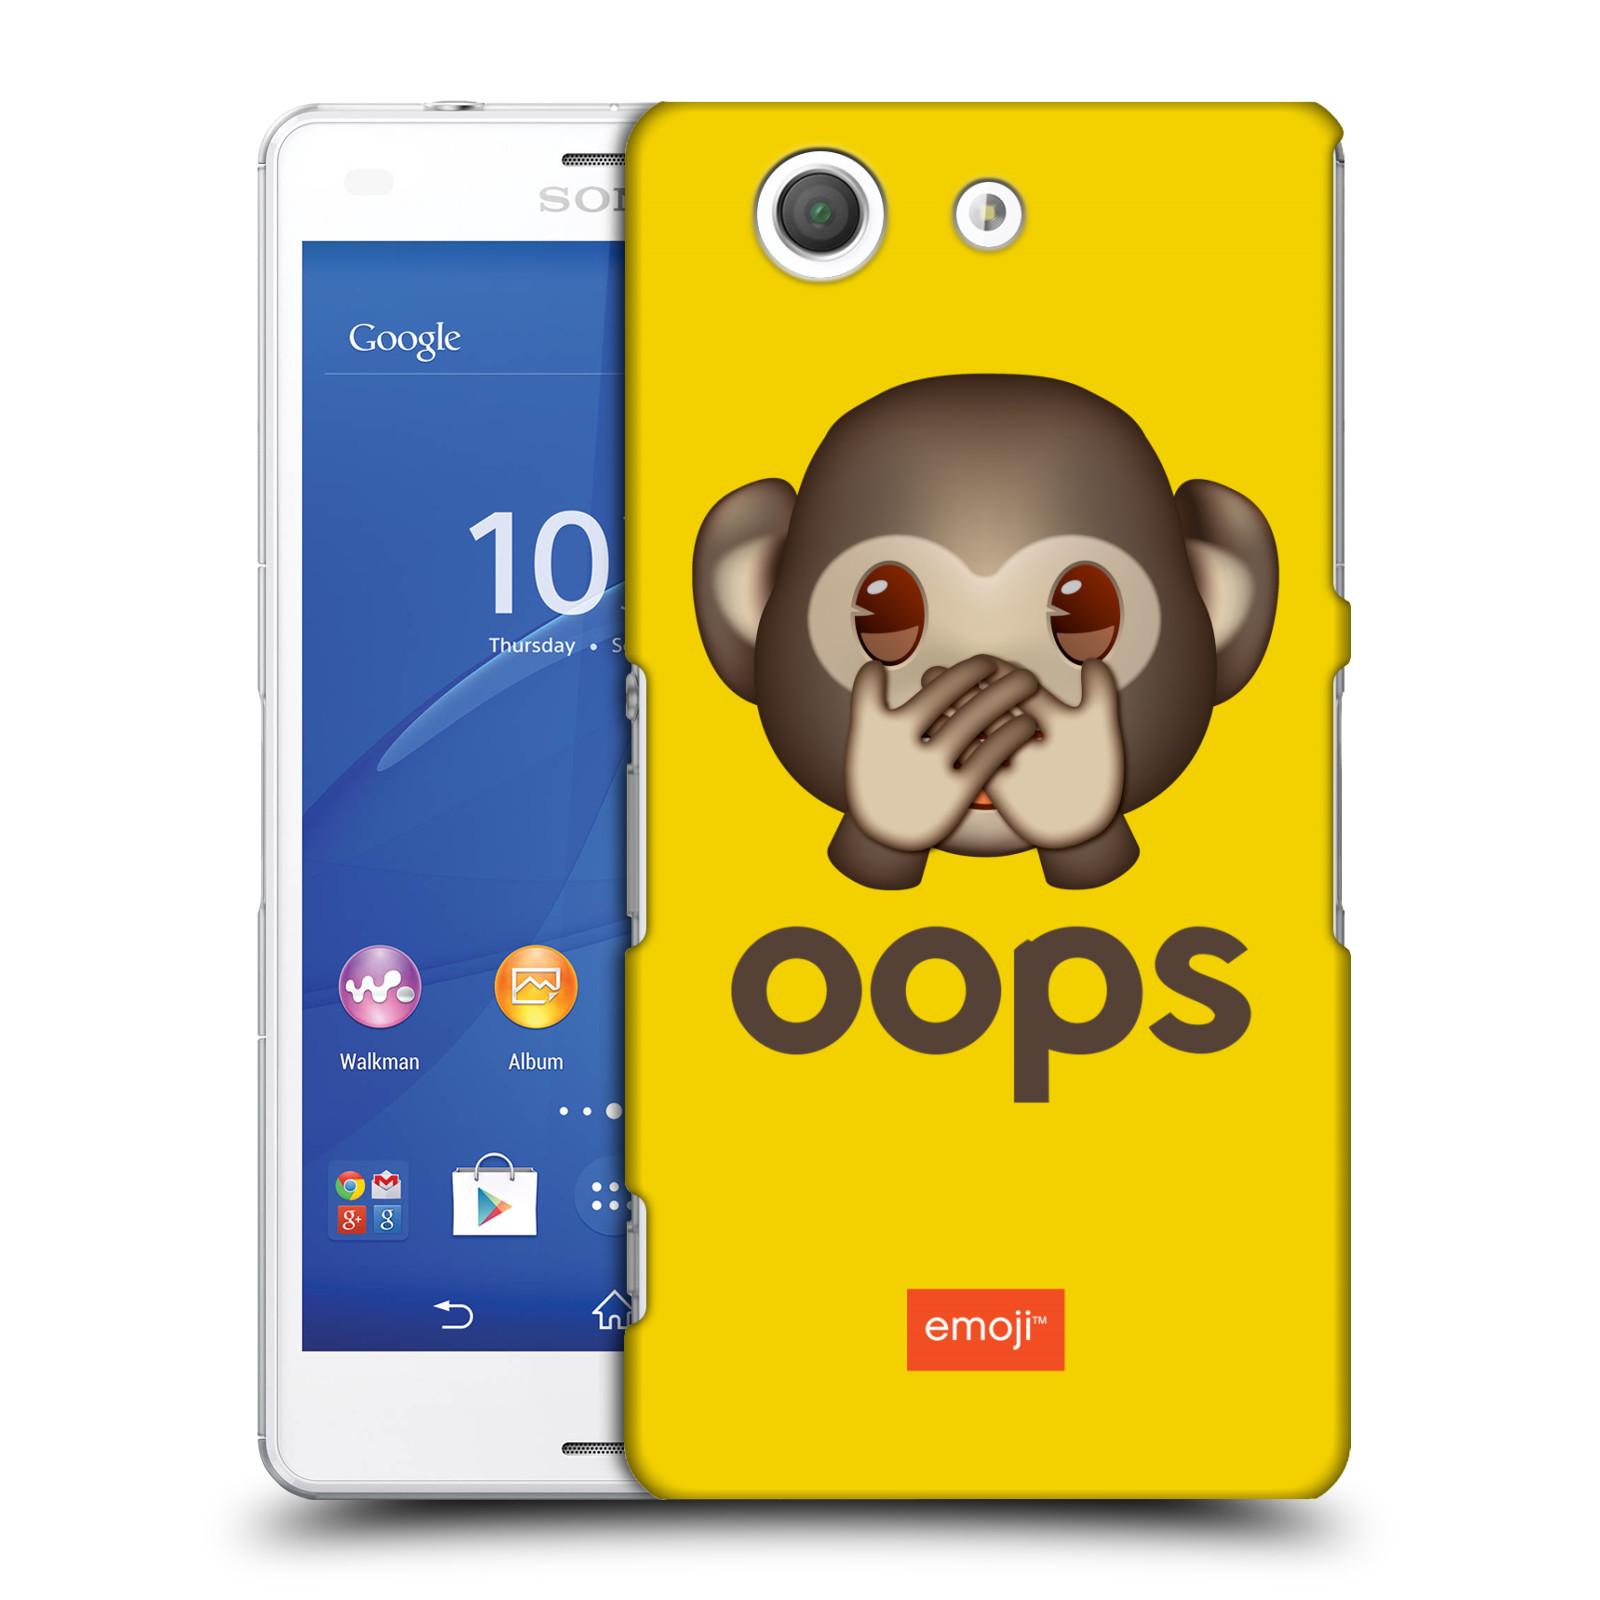 Pouzdro na mobil Sony Xperia Z3 COMPACT - HEAD CASE - Emoji opička Oops